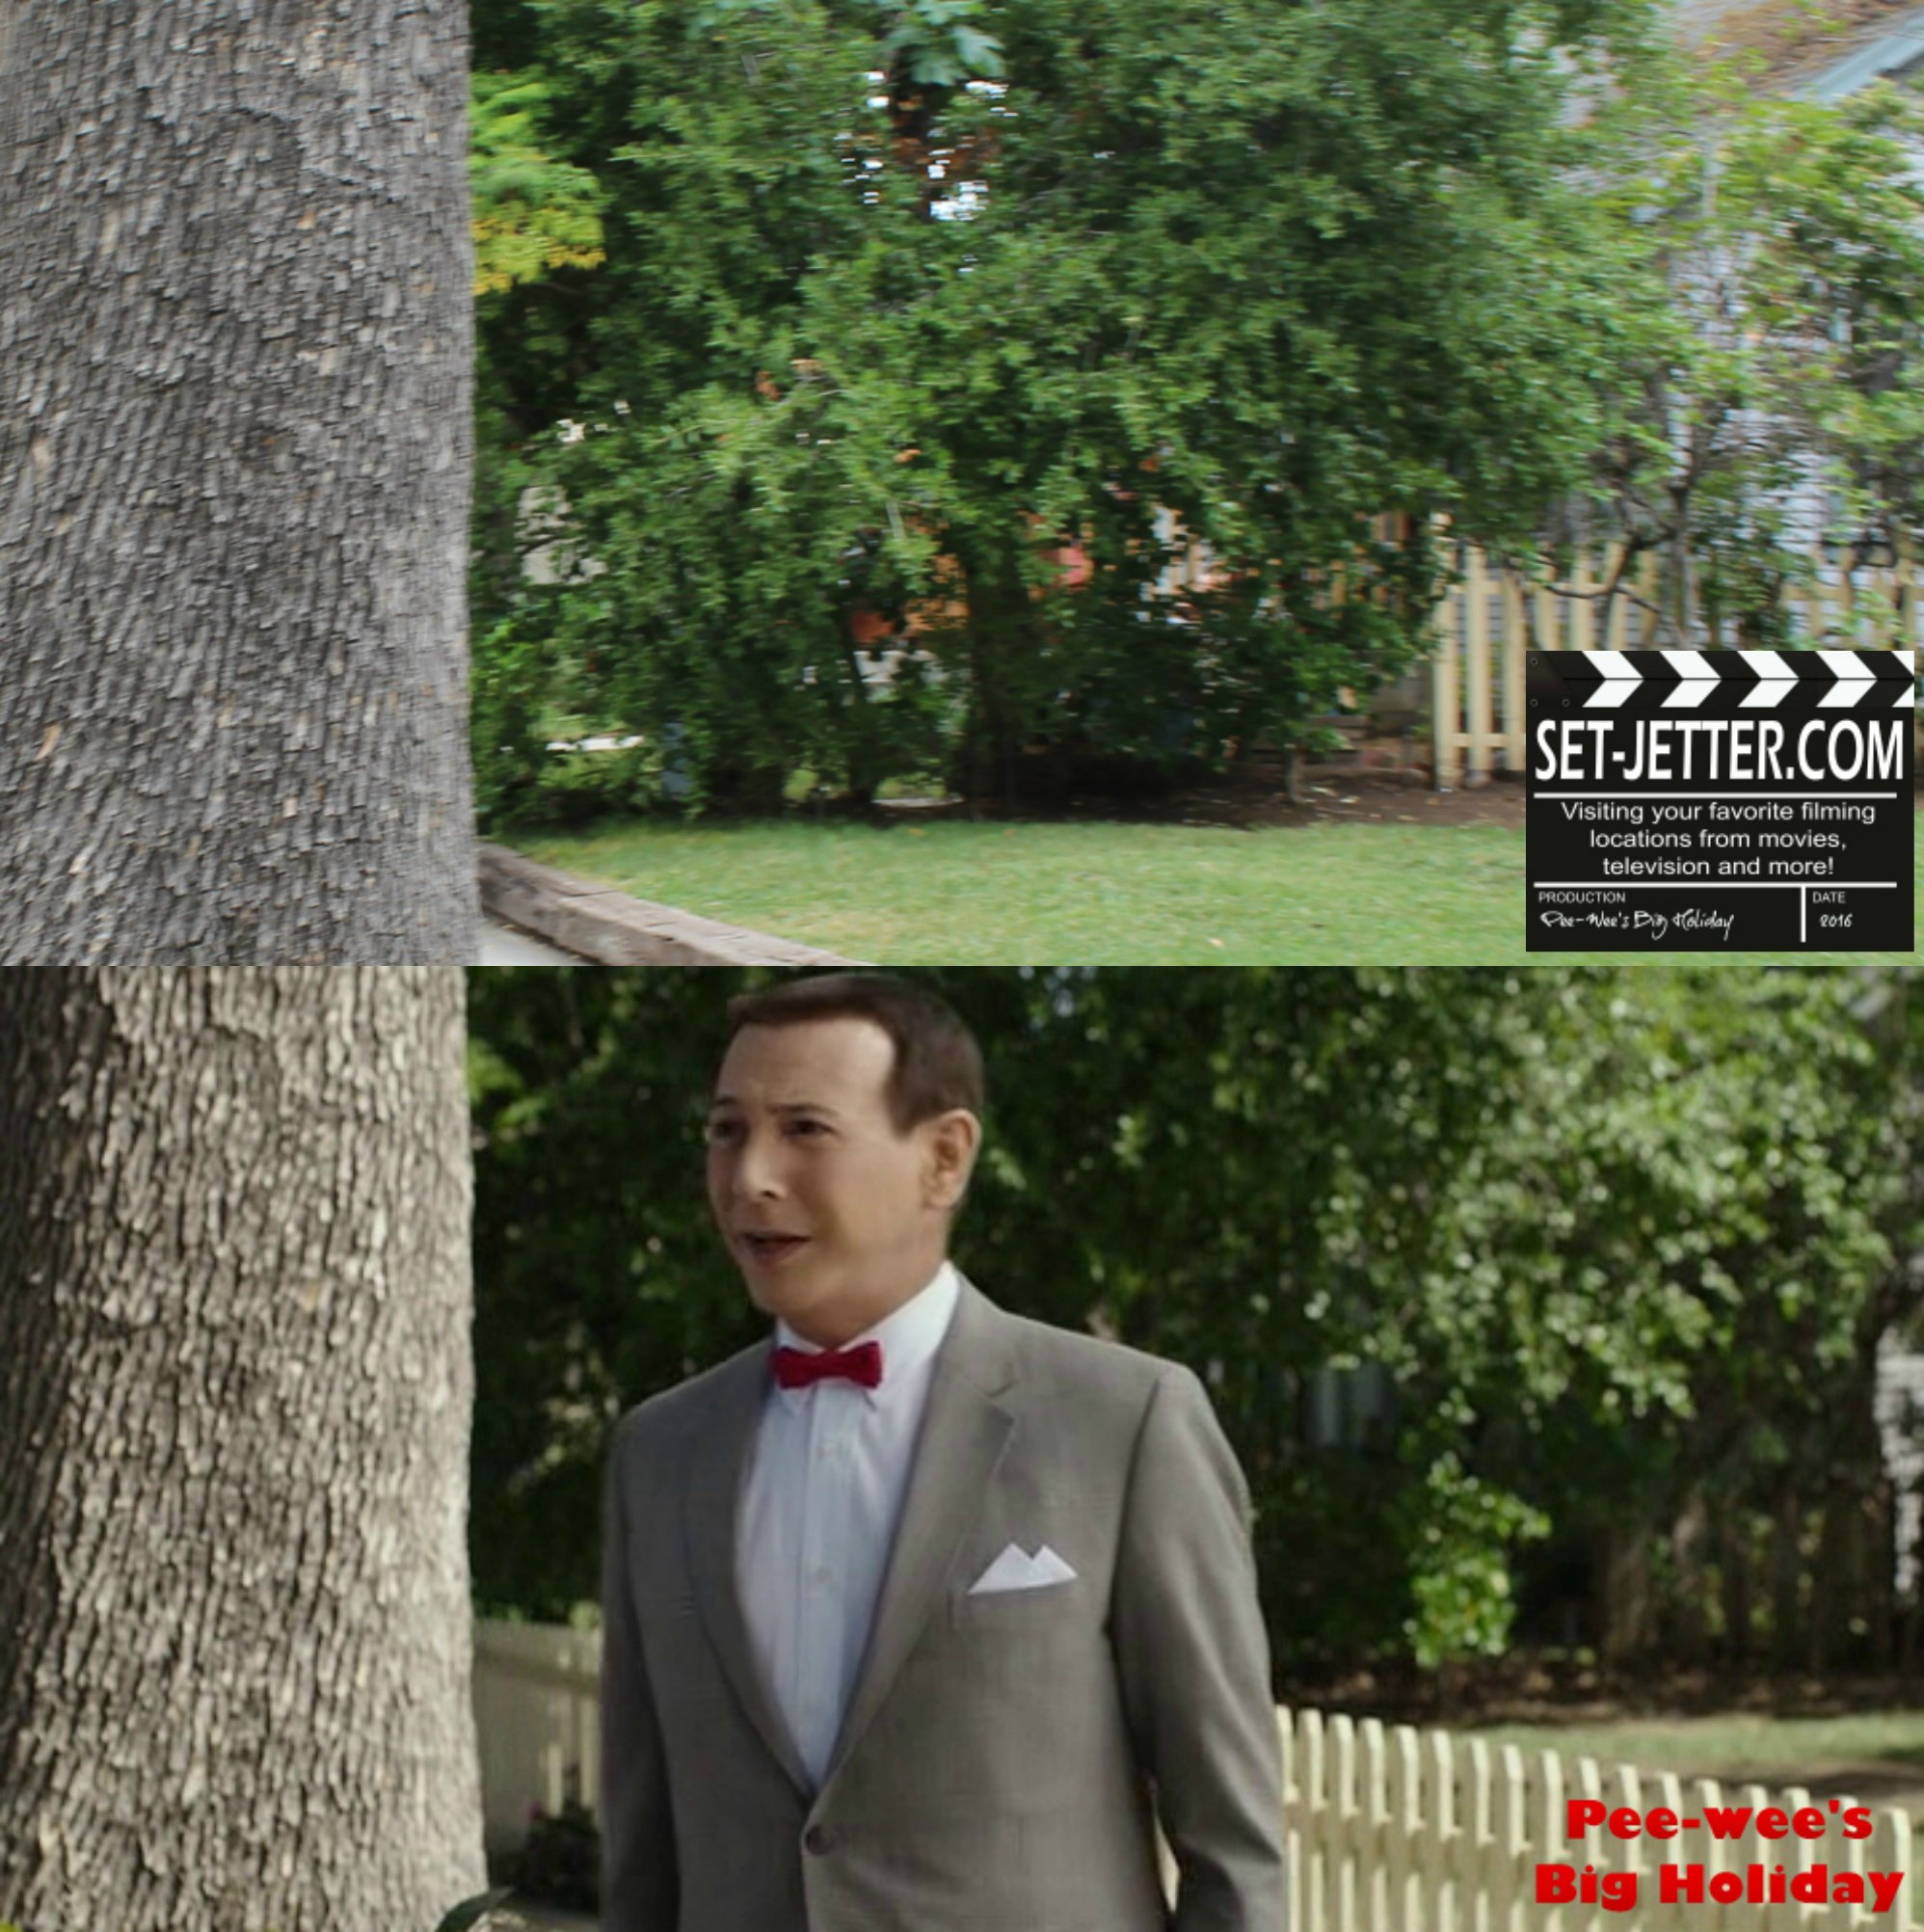 Pee Wee's Big Holiday comparison 318.jpg